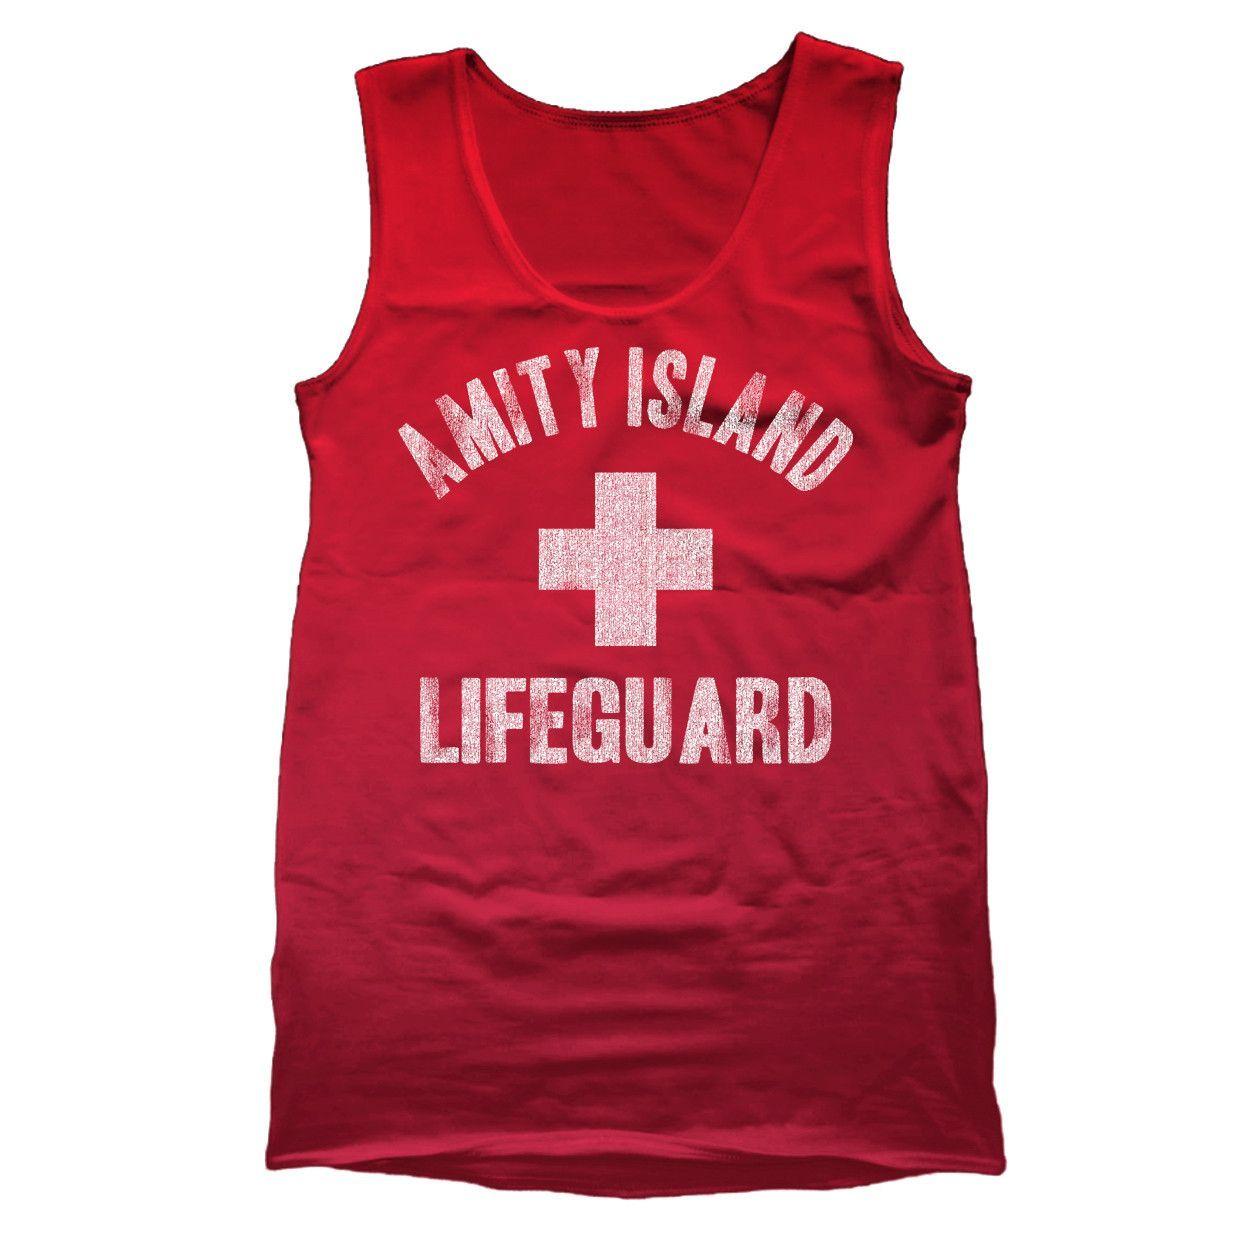 18cba7eb469f85 Amity Island Lifeguard Tank Top